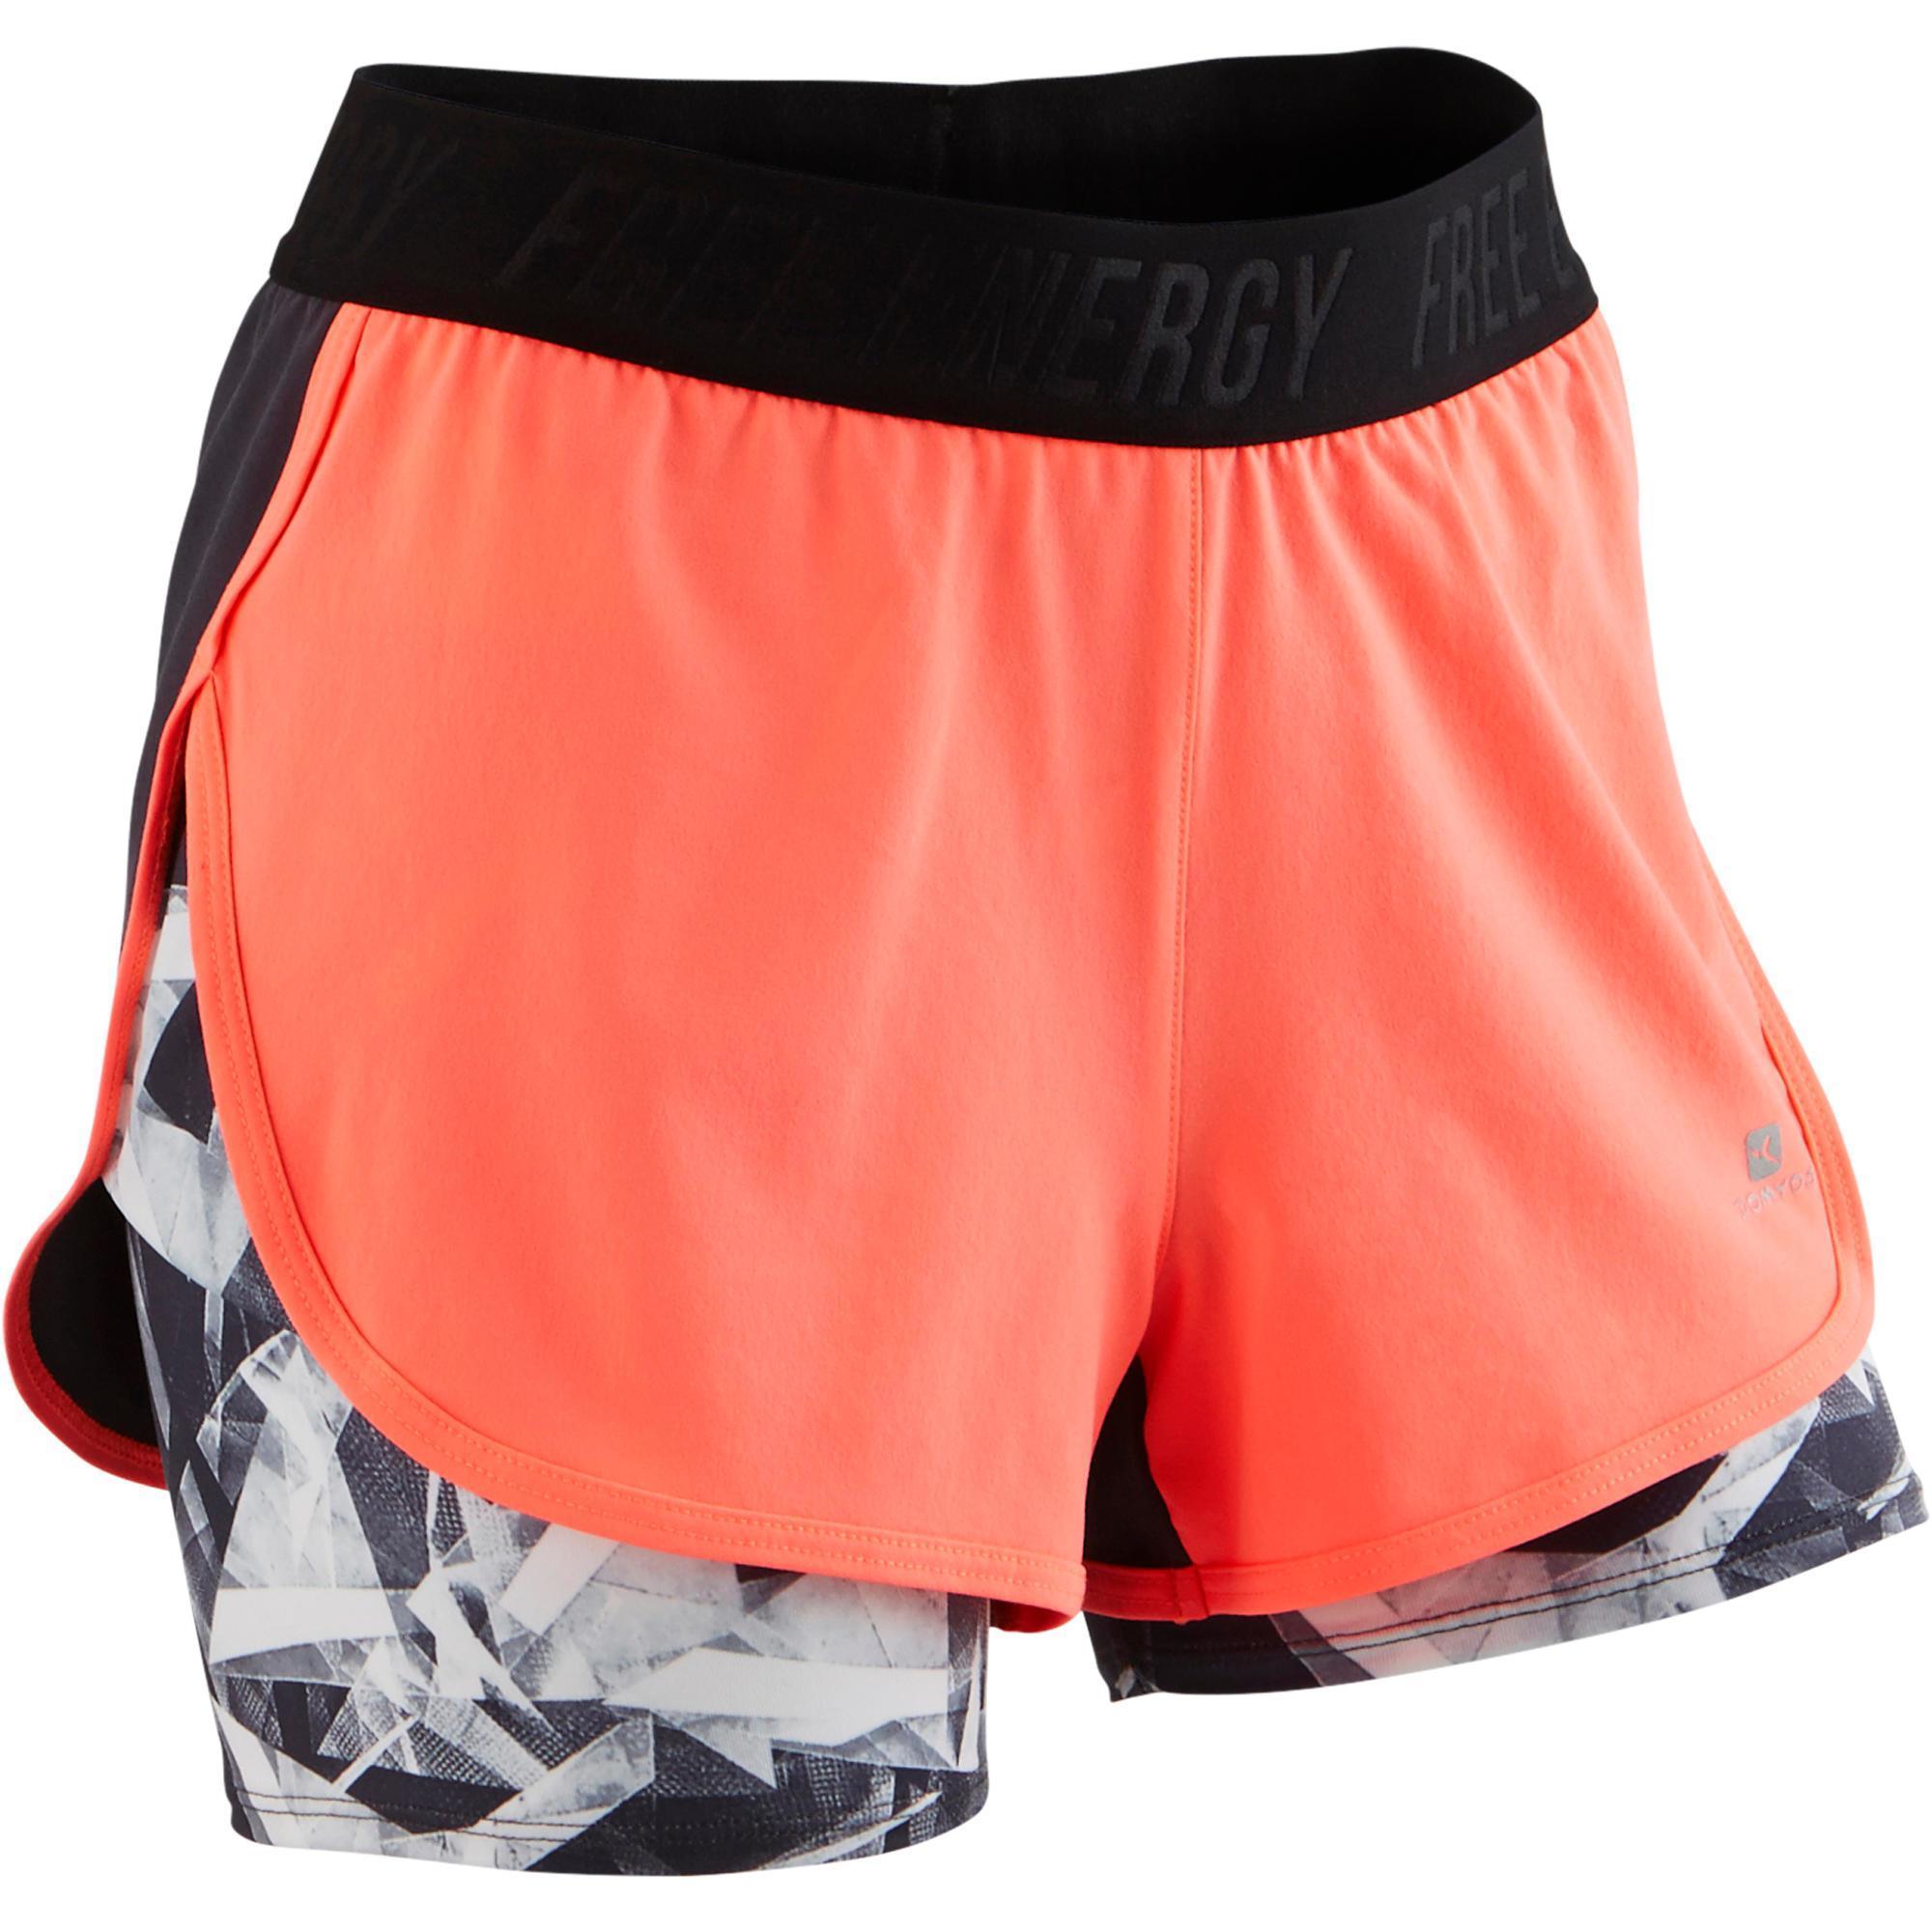 Kinder Sporthose kurz W900 Gym Kinder koralle grau bedruckt | 03608419173192